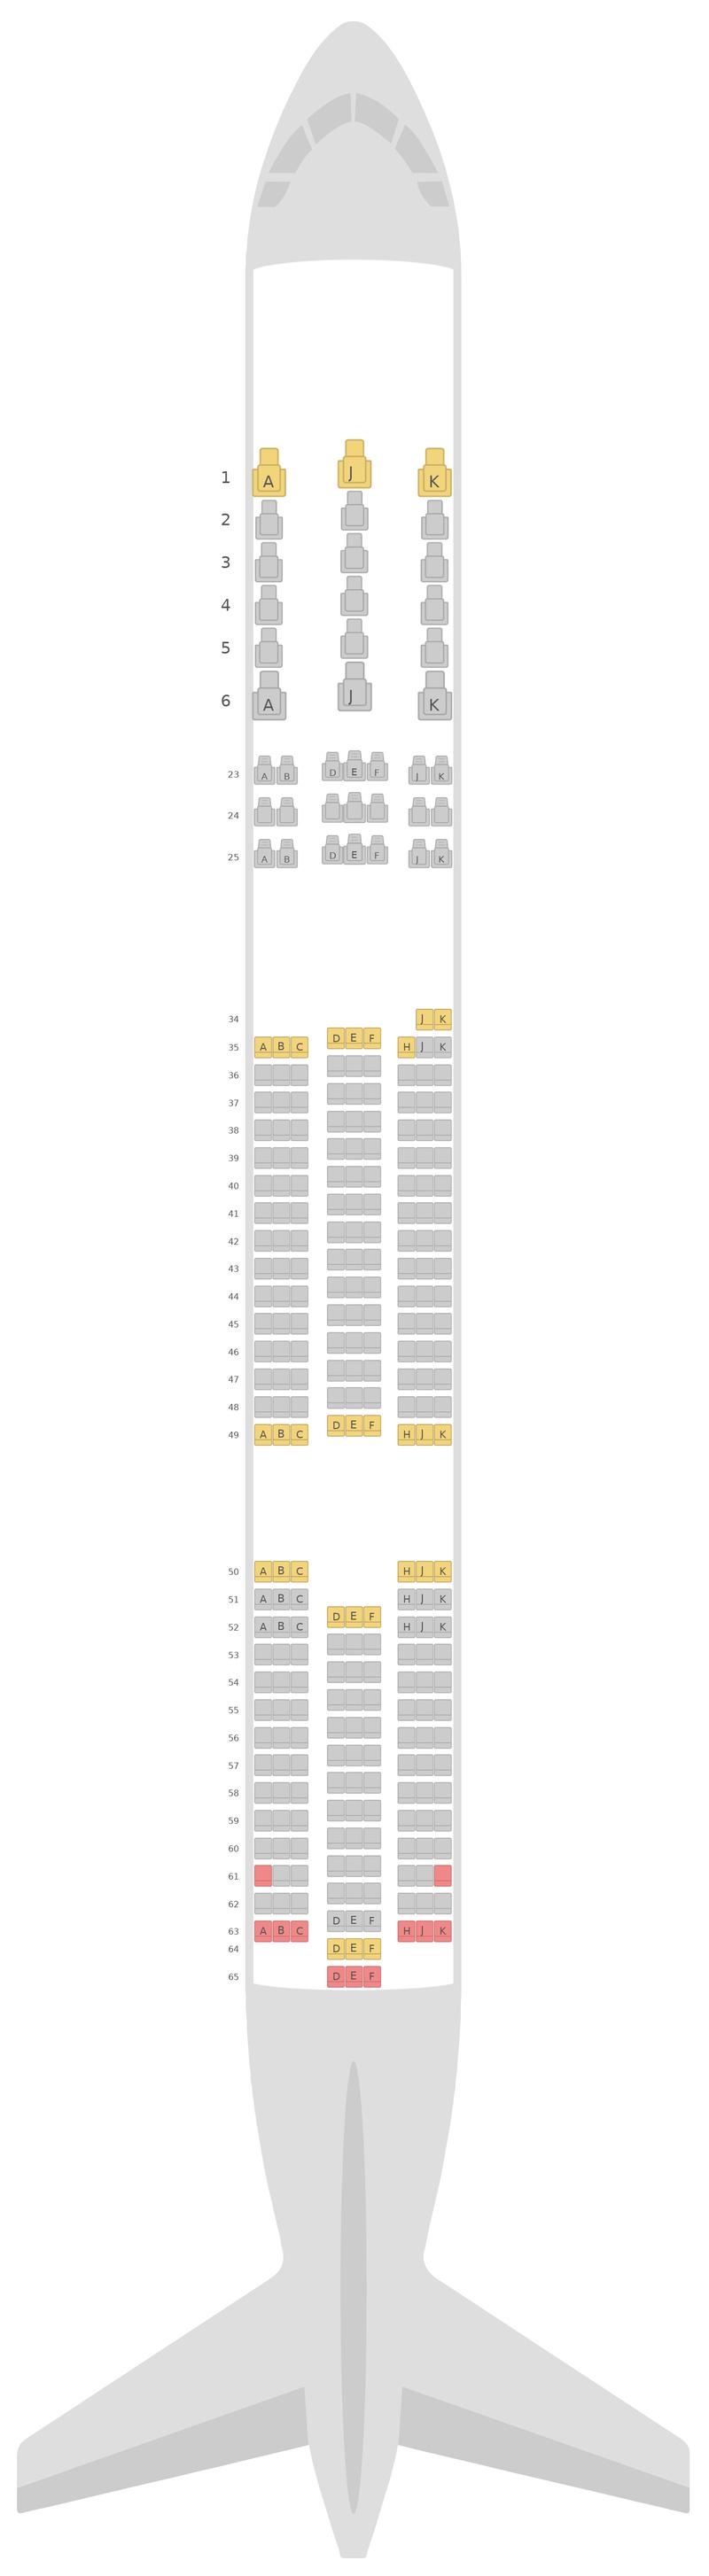 Схема салона Боинг 787-9 (789) v1 Air New Zealand